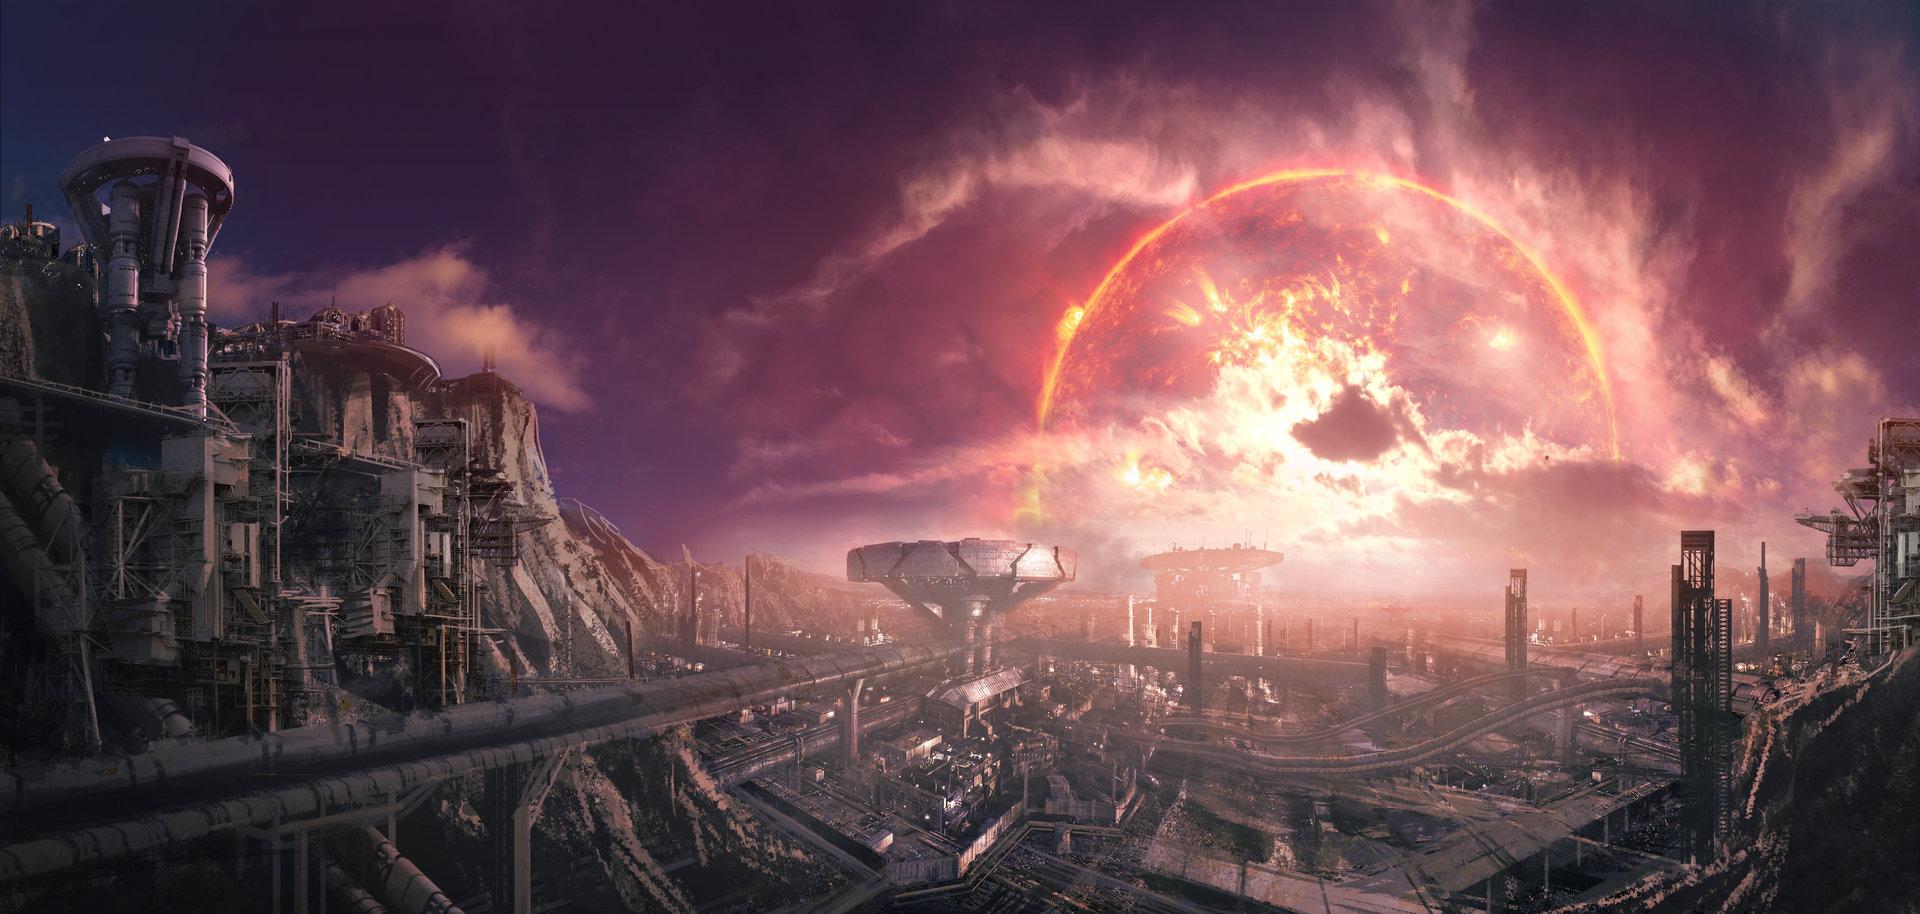 Tu bui o2 sky 03 red giant light source